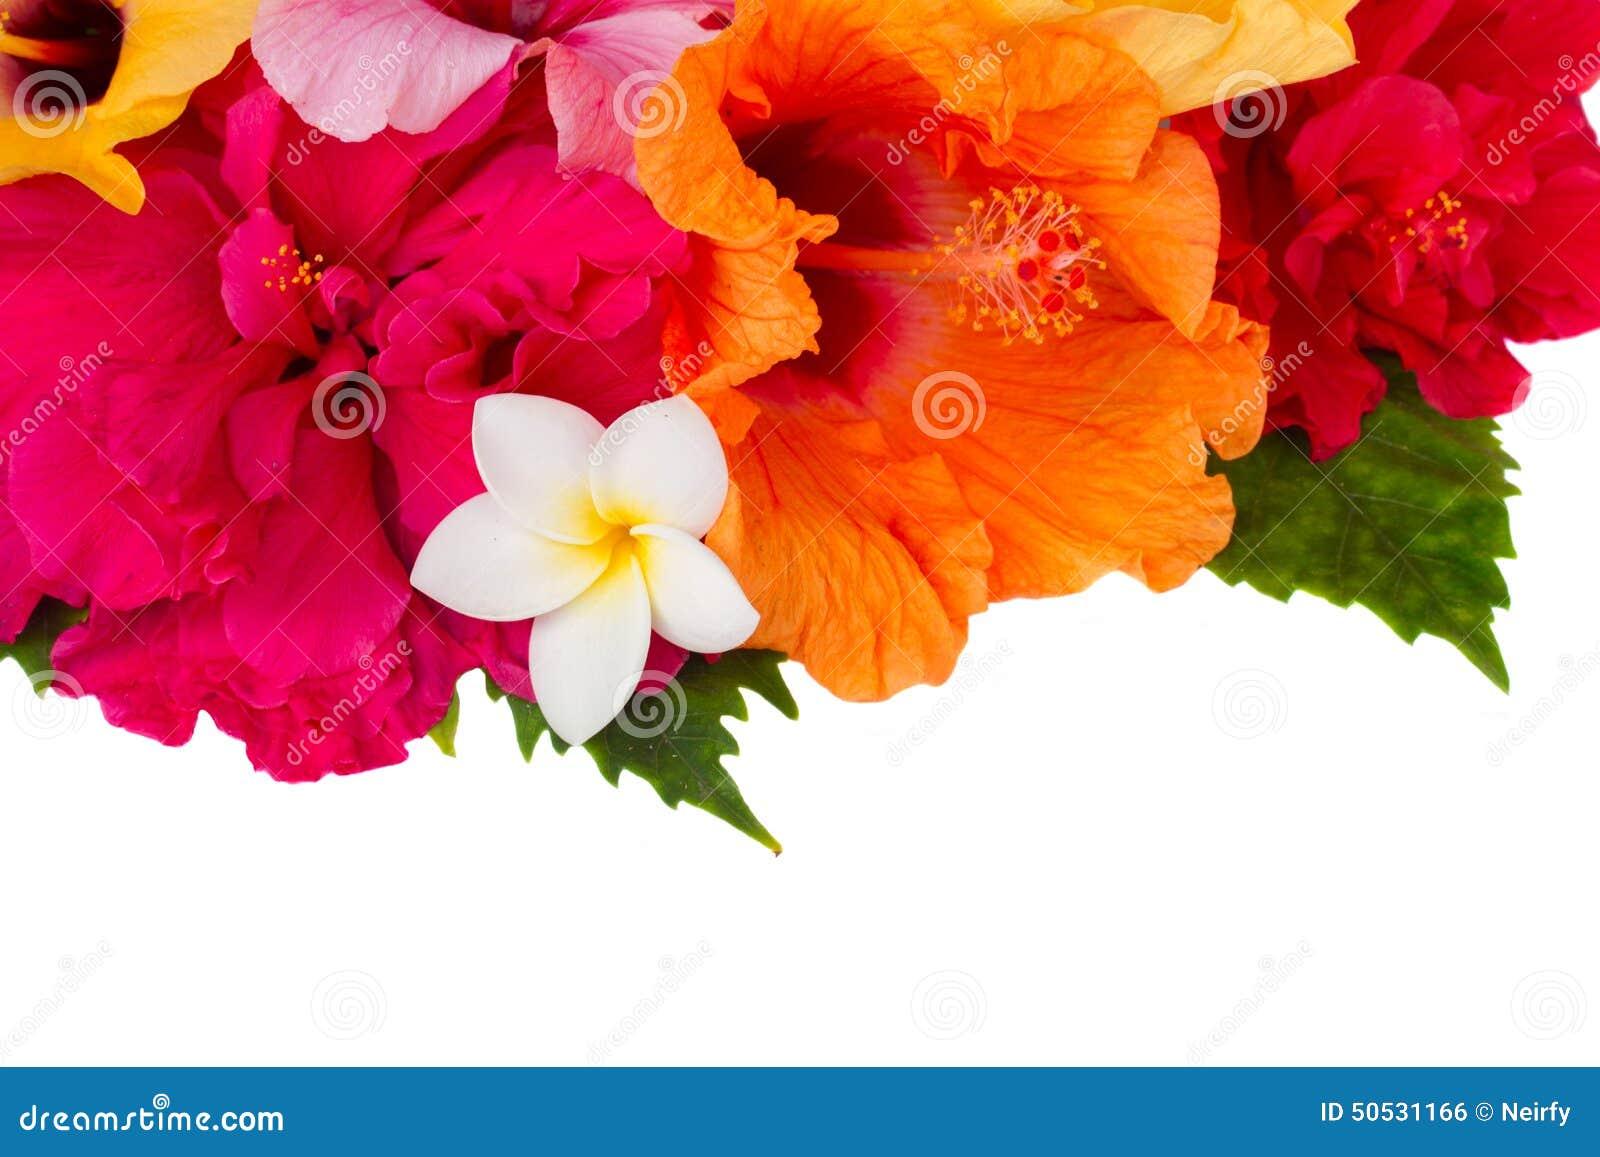 Border Of Colorful Hibiscus Flowers Stock Photo Image Of Hawaiian